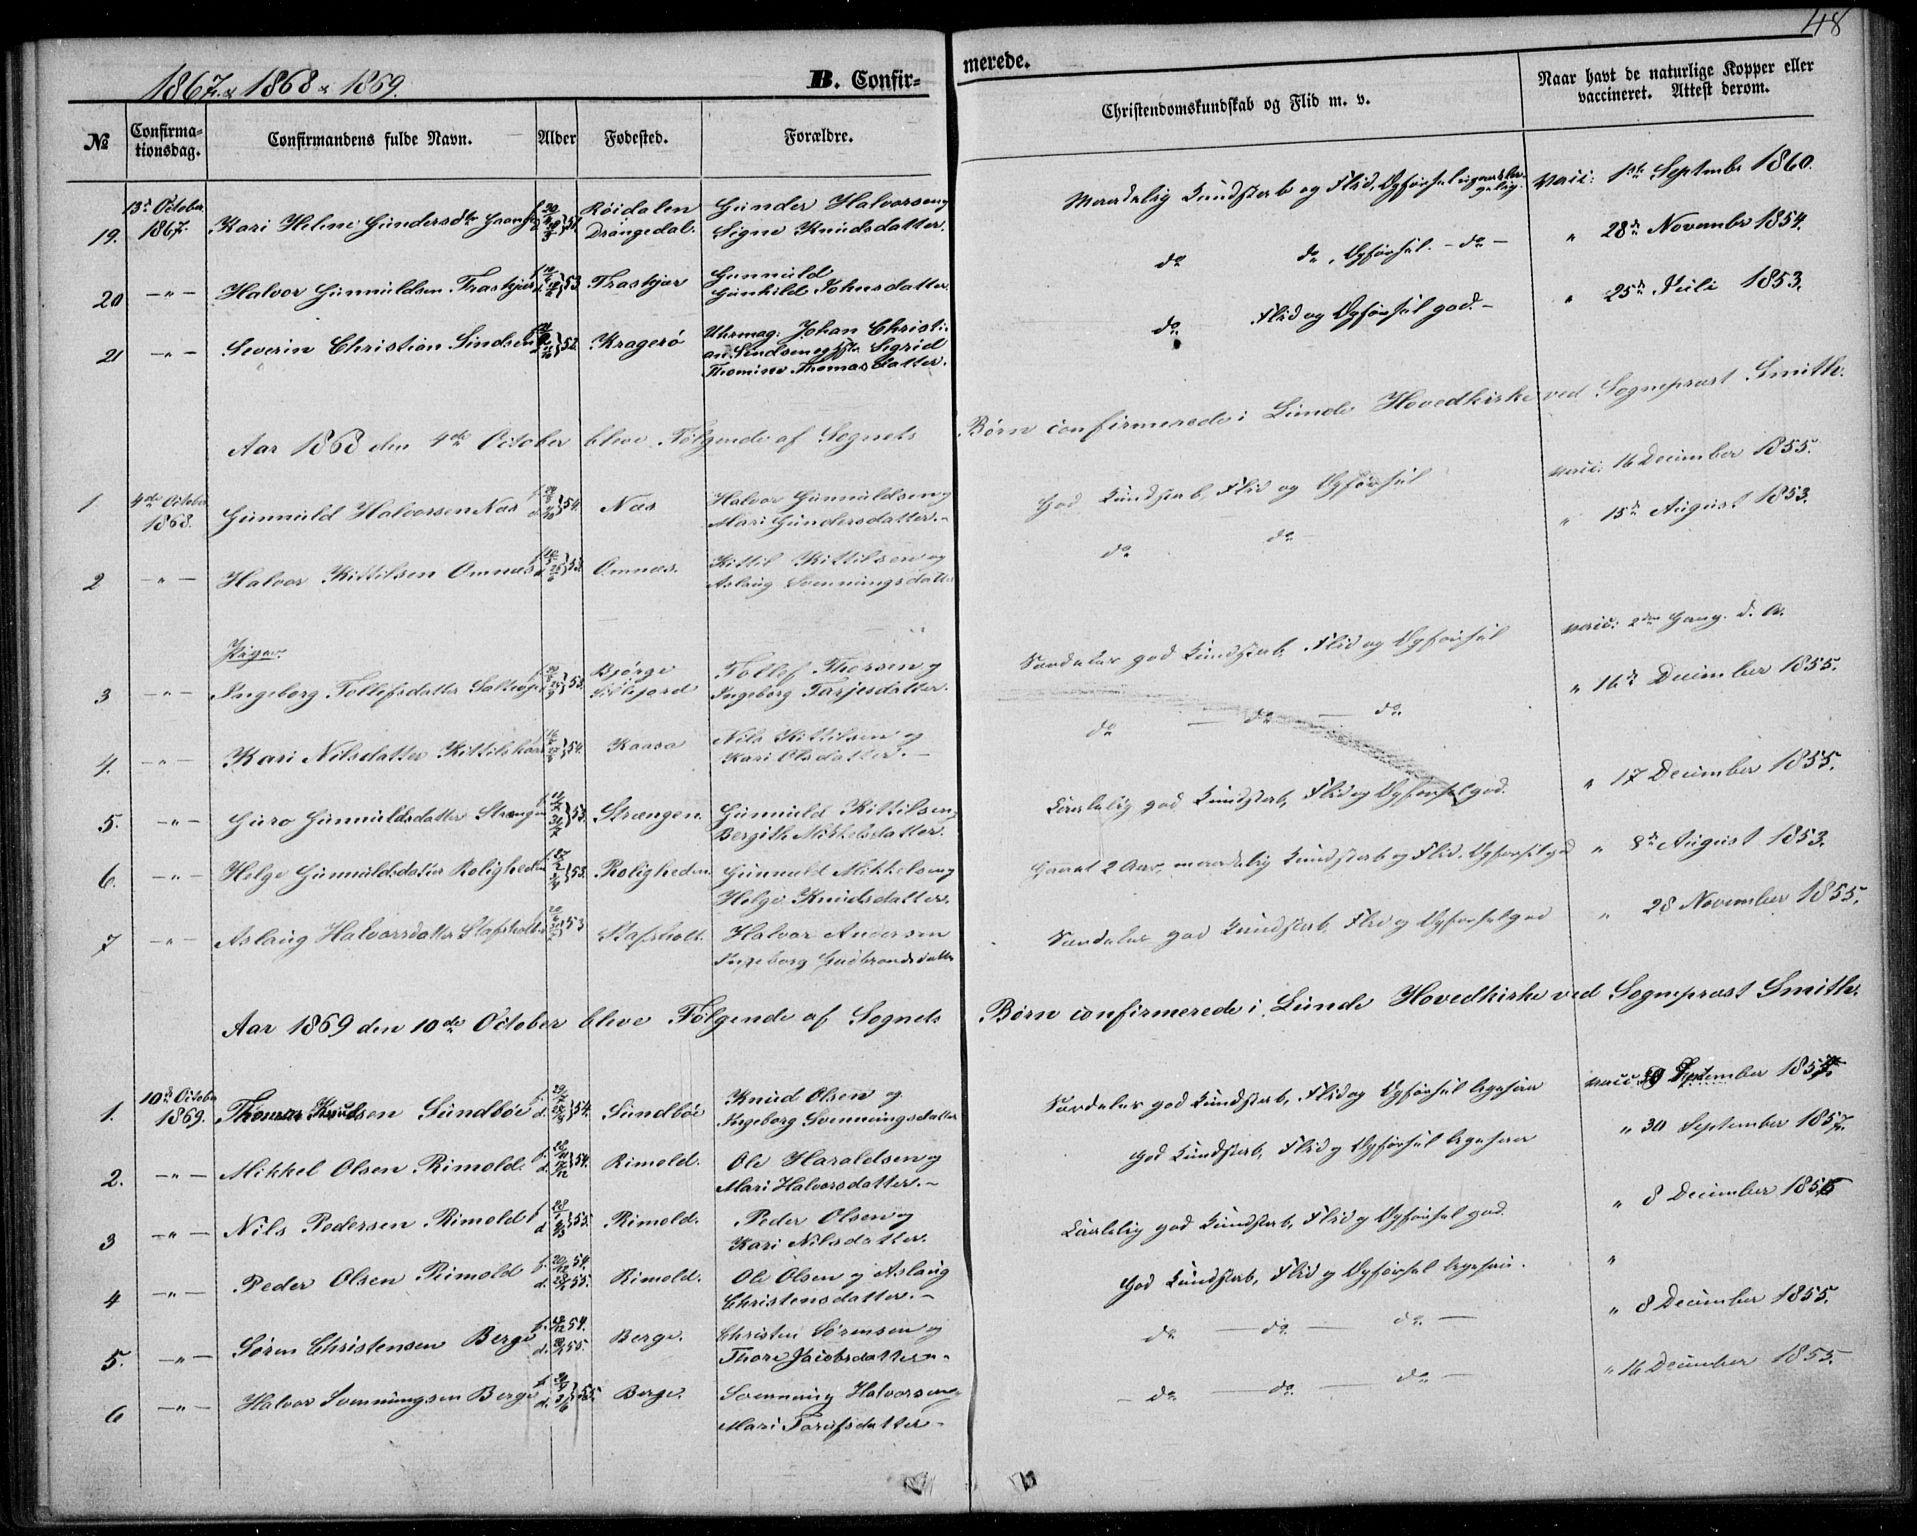 SAKO, Lunde kirkebøker, F/Fb/L0002: Ministerialbok nr. II 2, 1861-1881, s. 48